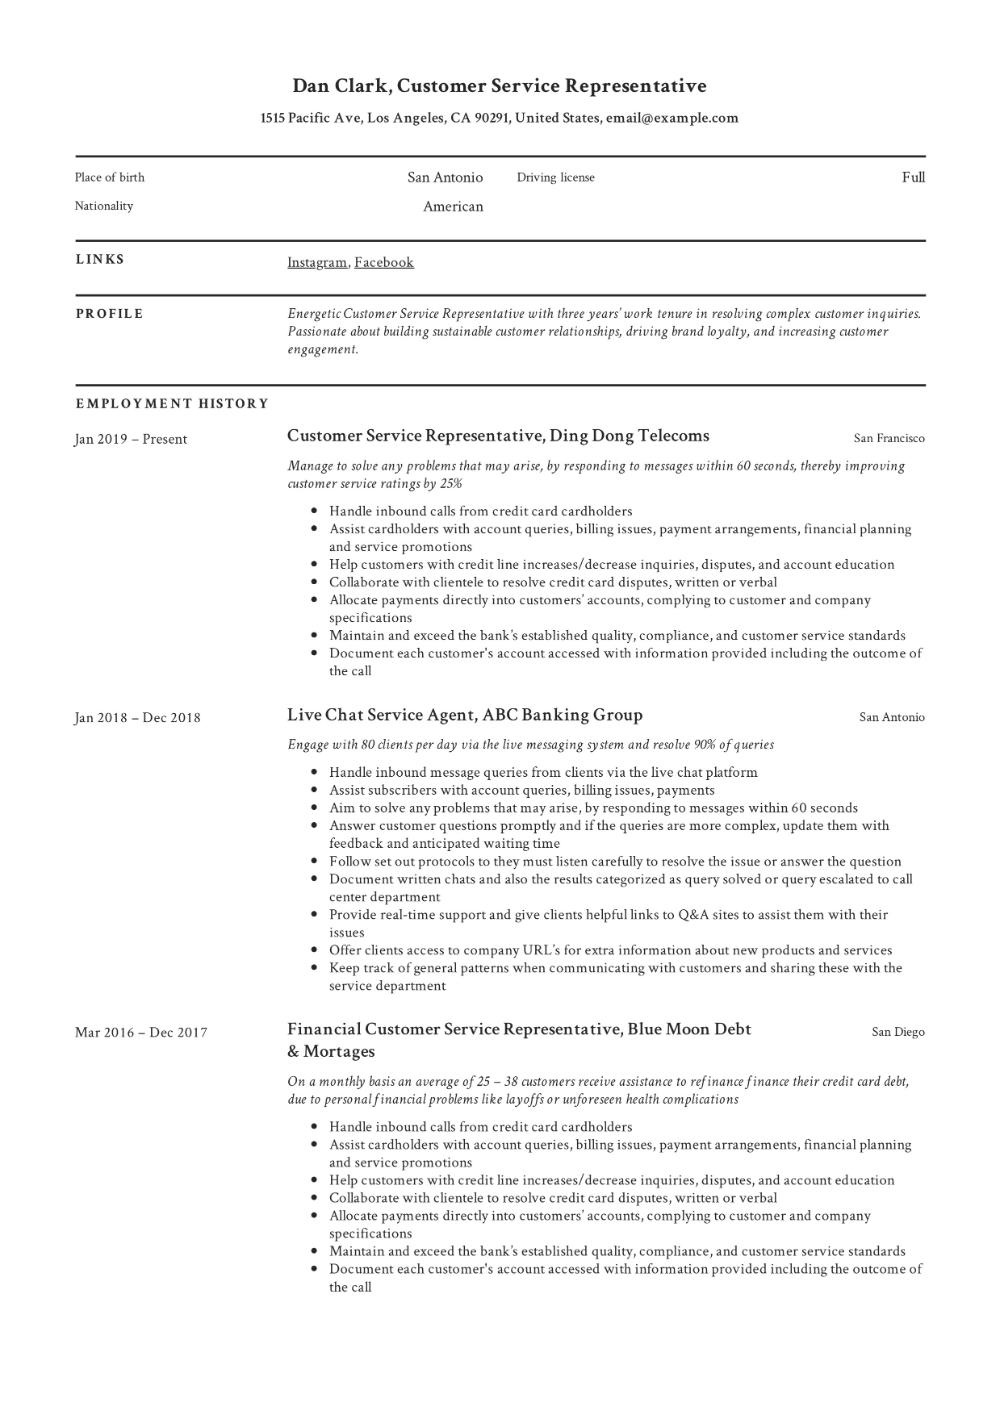 How to Customer Service Representative Resume & + 12 PDF